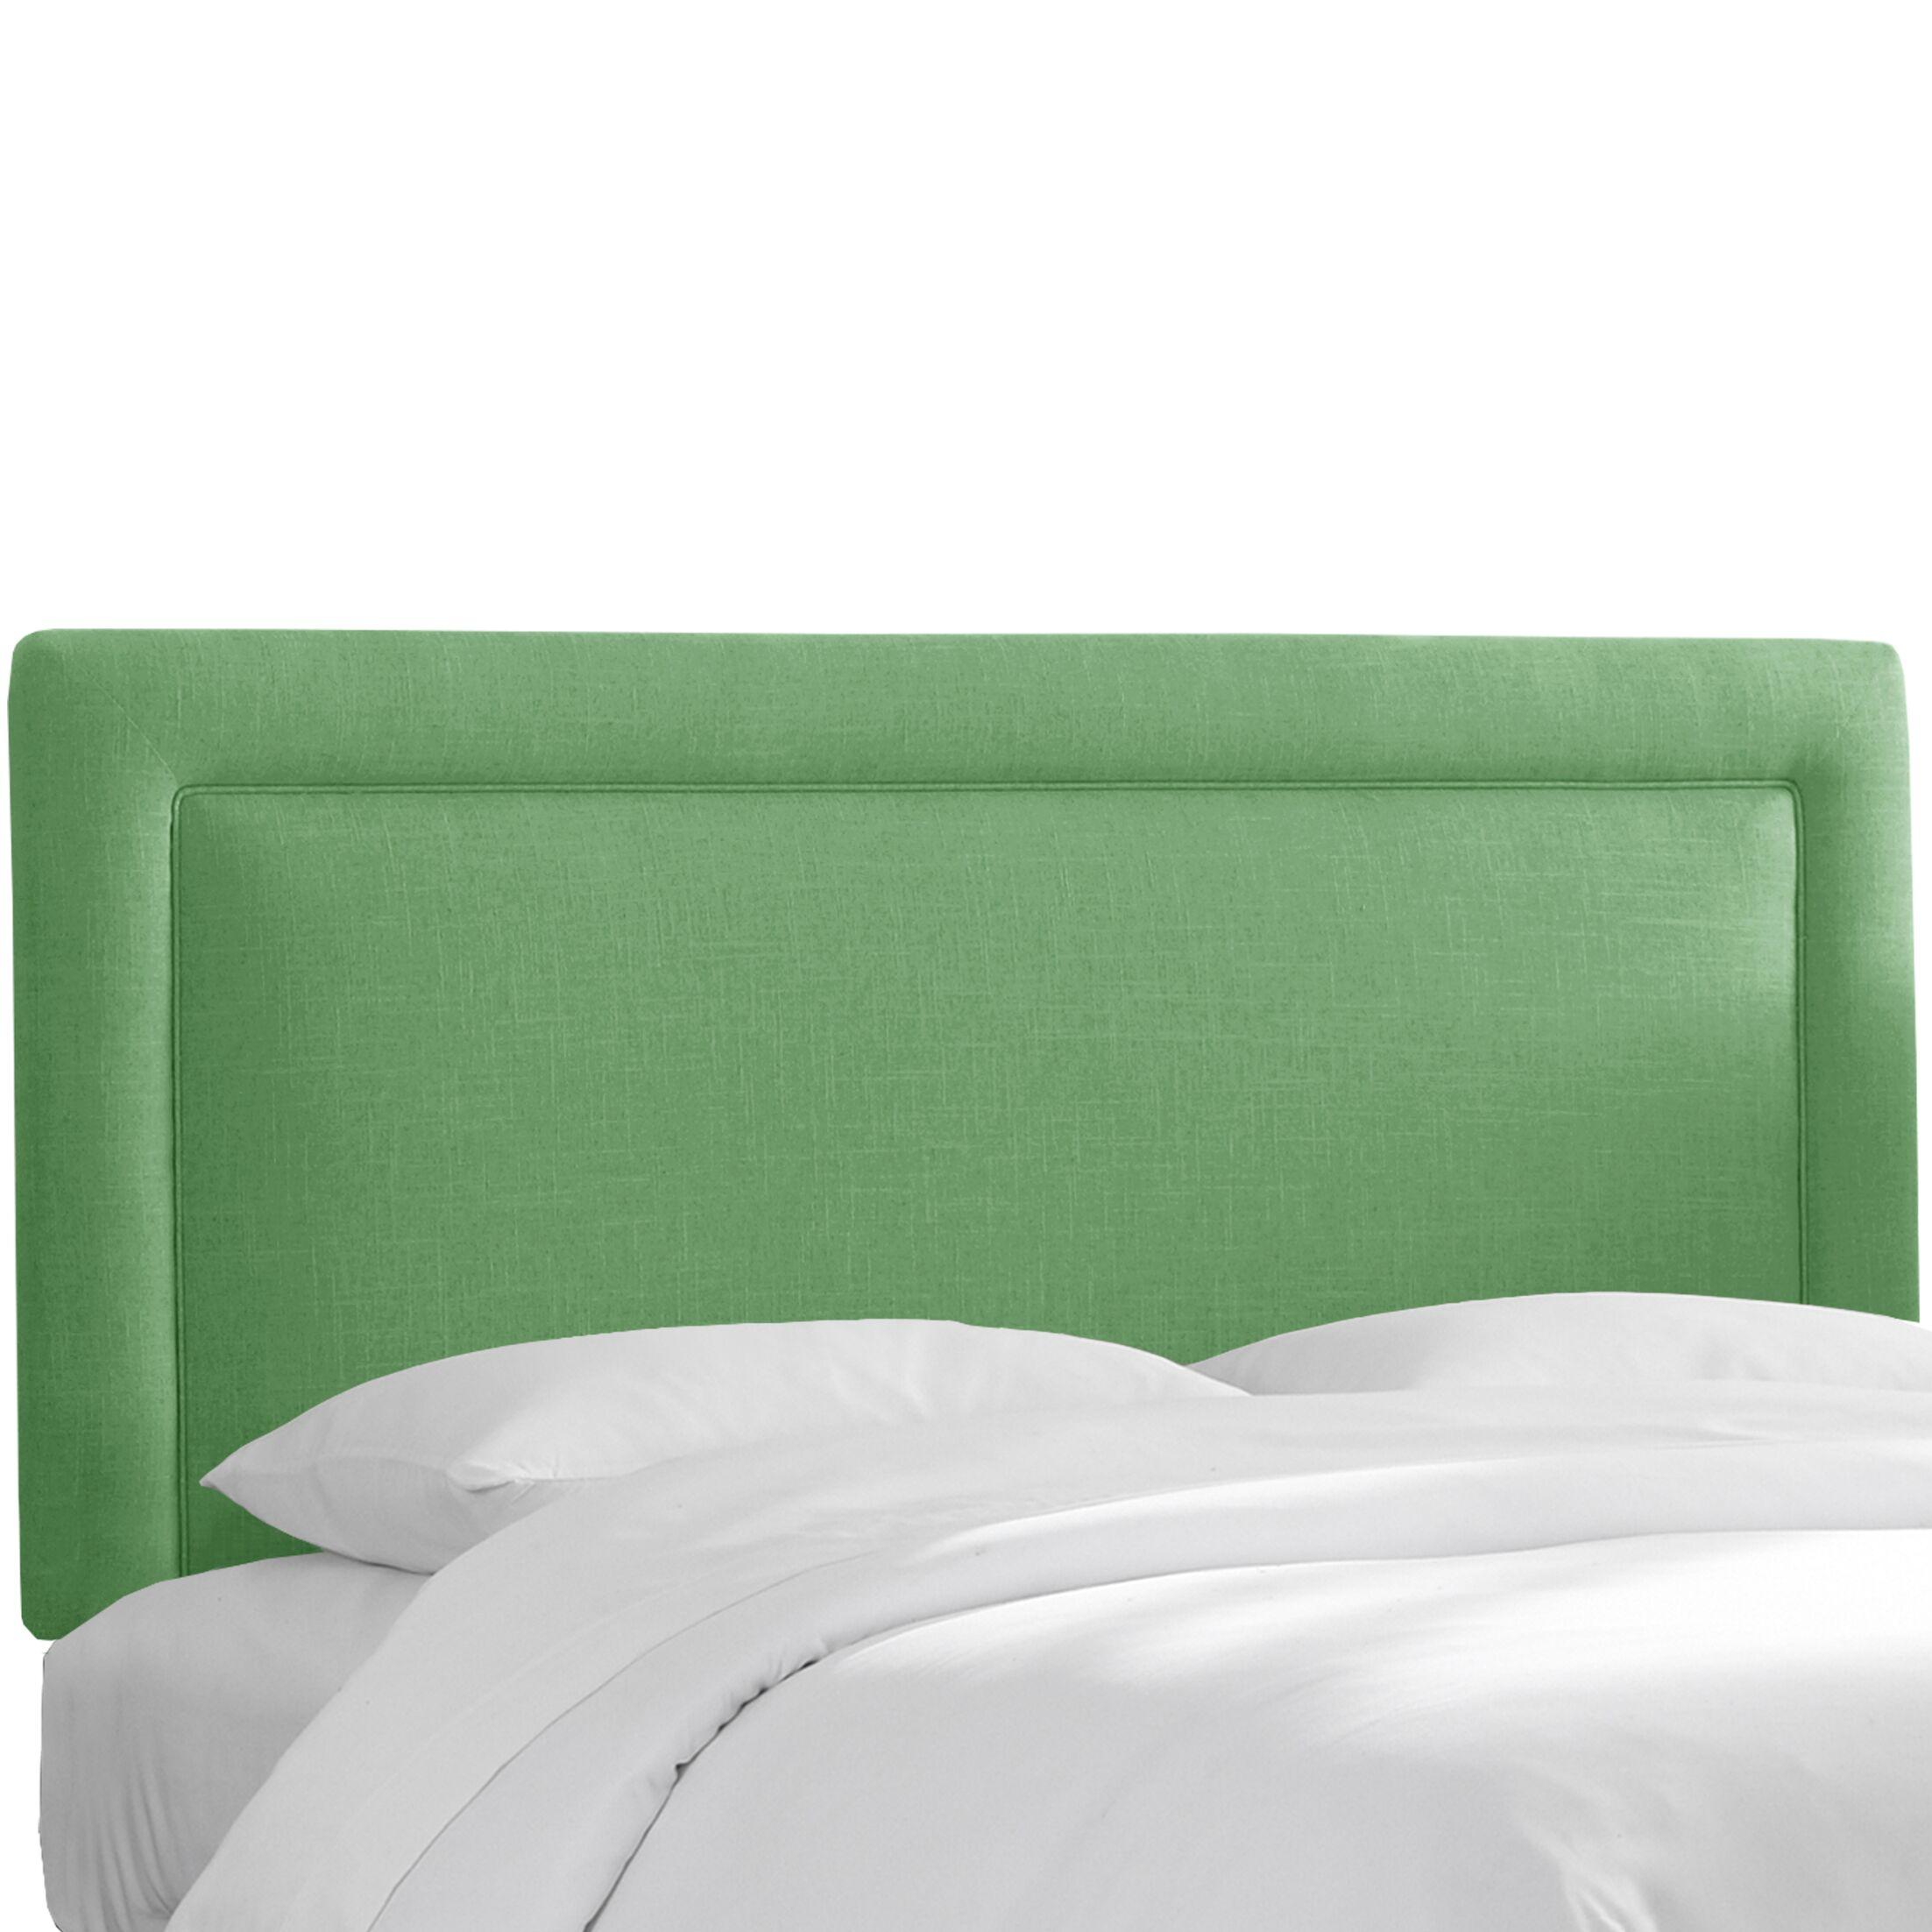 Hille Upholstered Panel Headboard Size: California King, Upholstery: Kelly Green